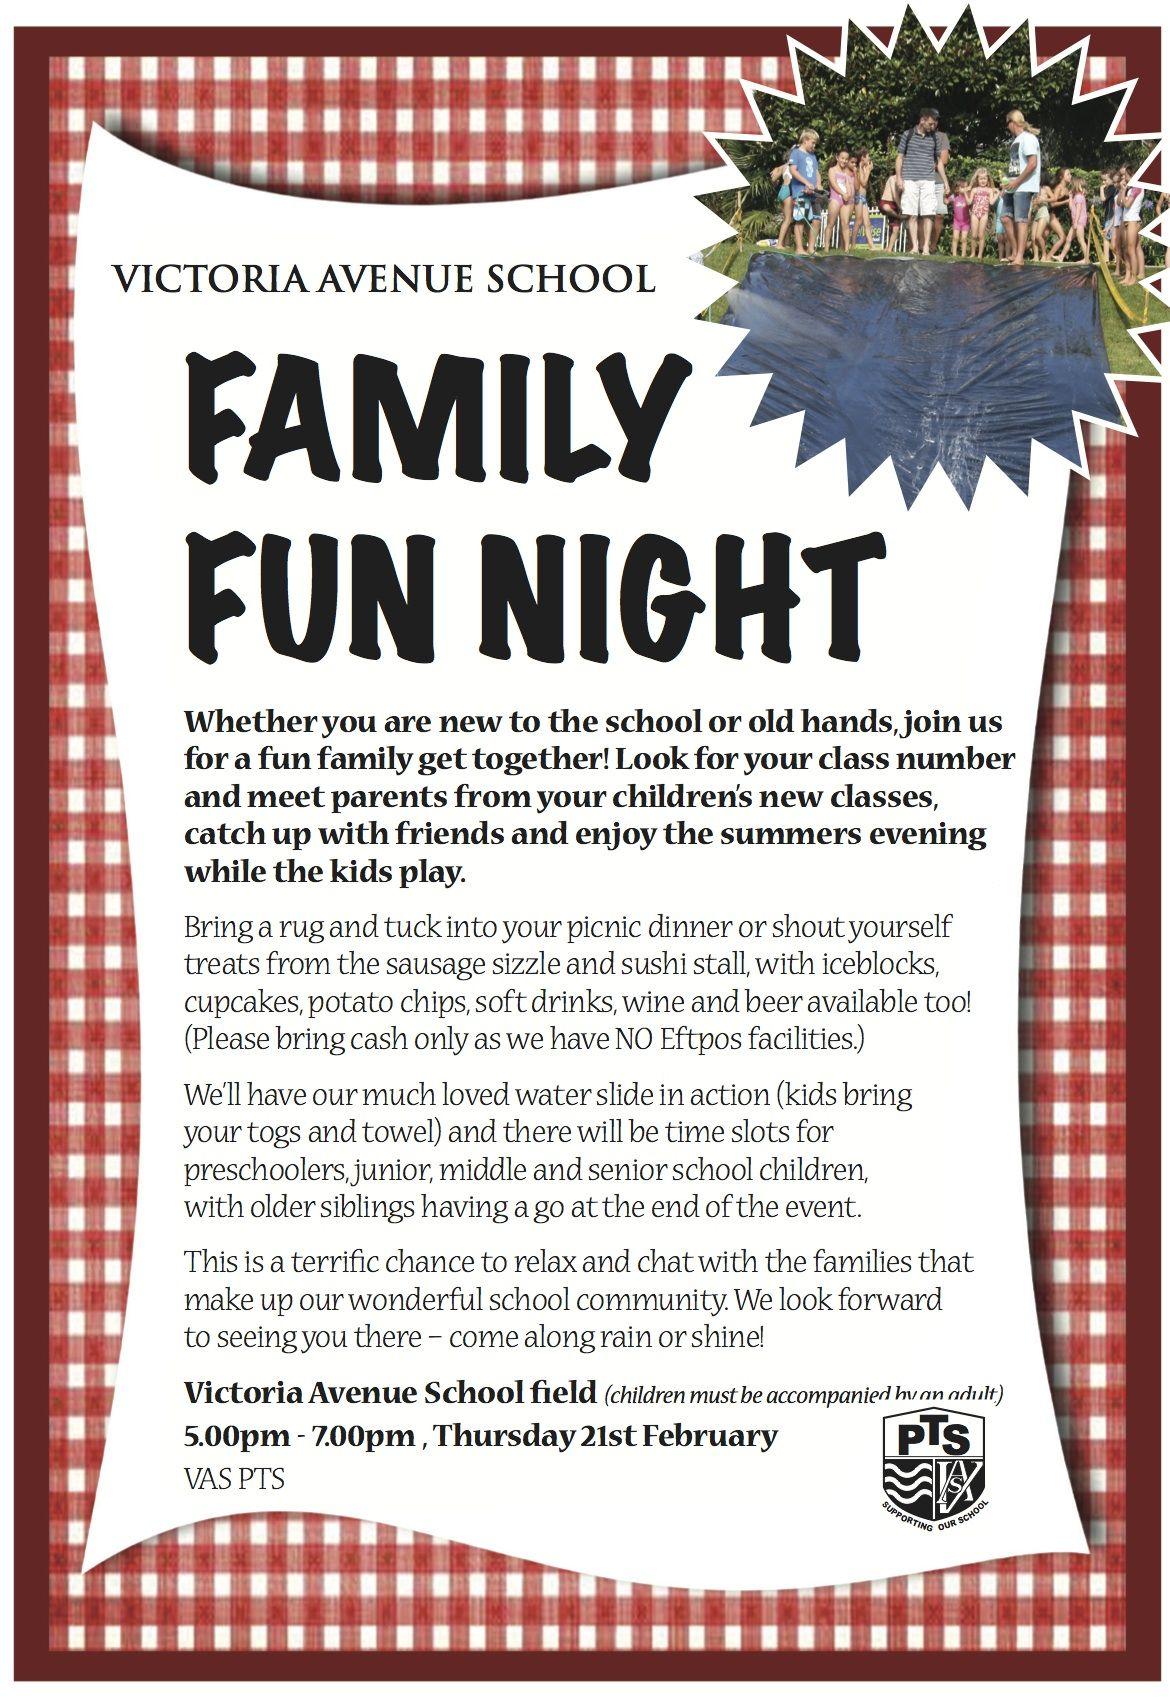 VASchool Family Fun Night Flyer